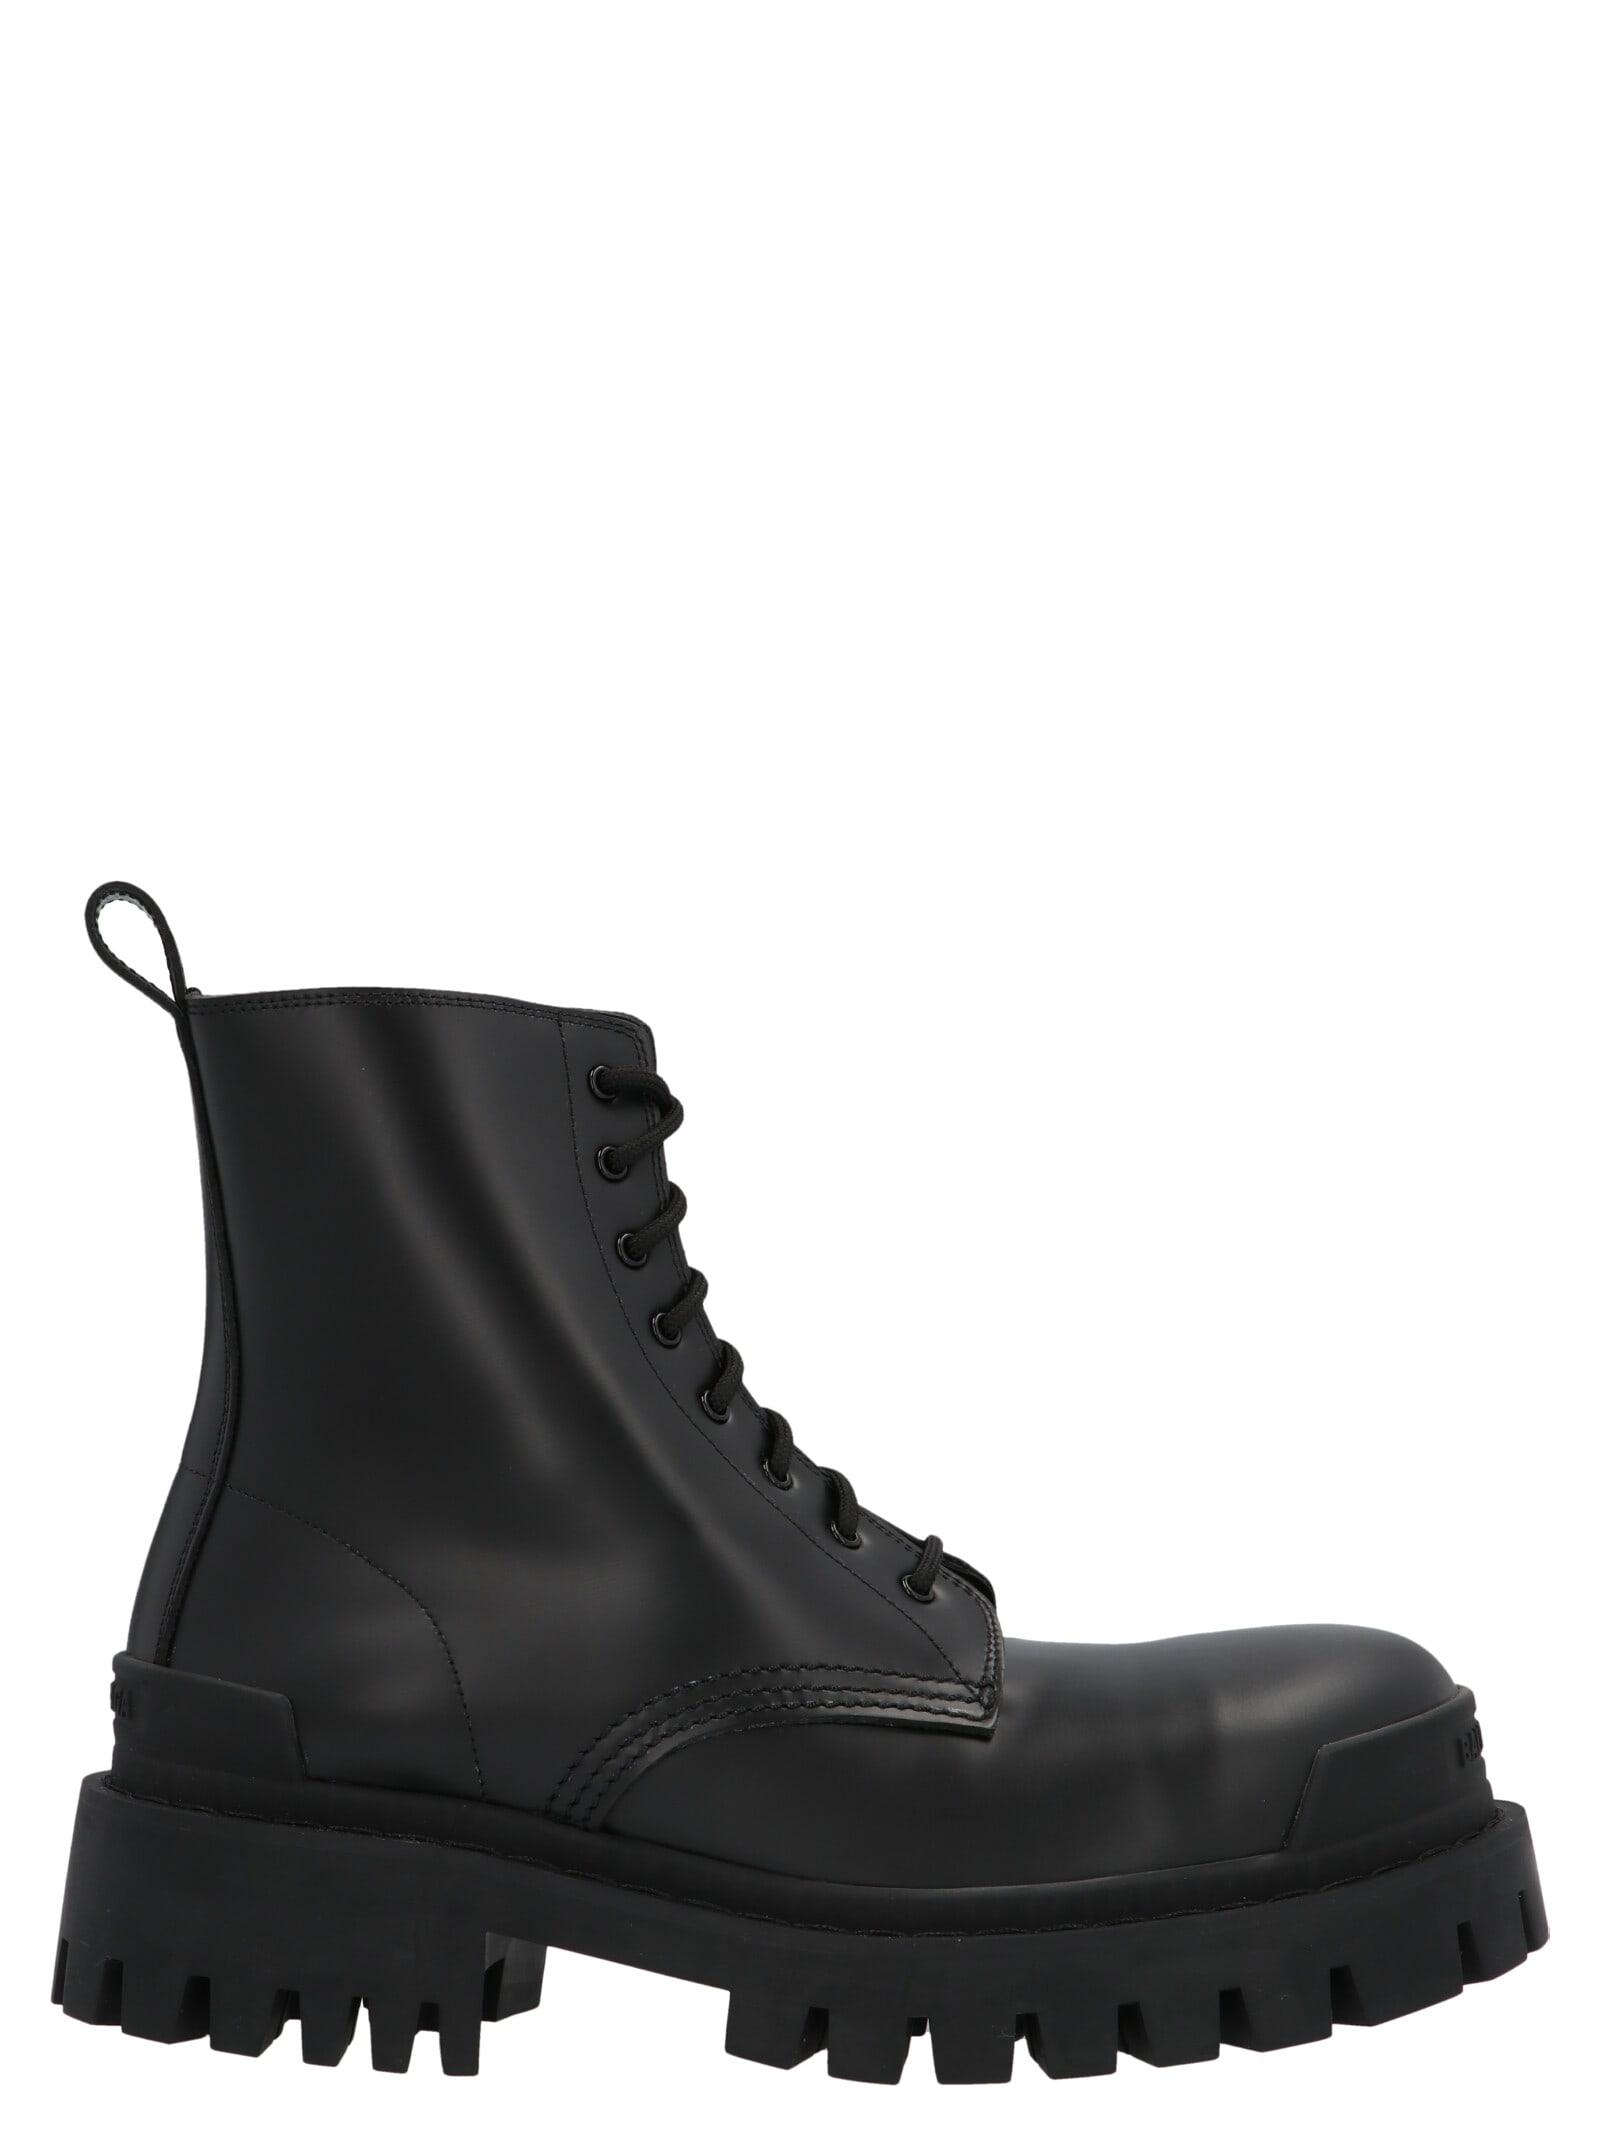 Balenciaga strike Shoes